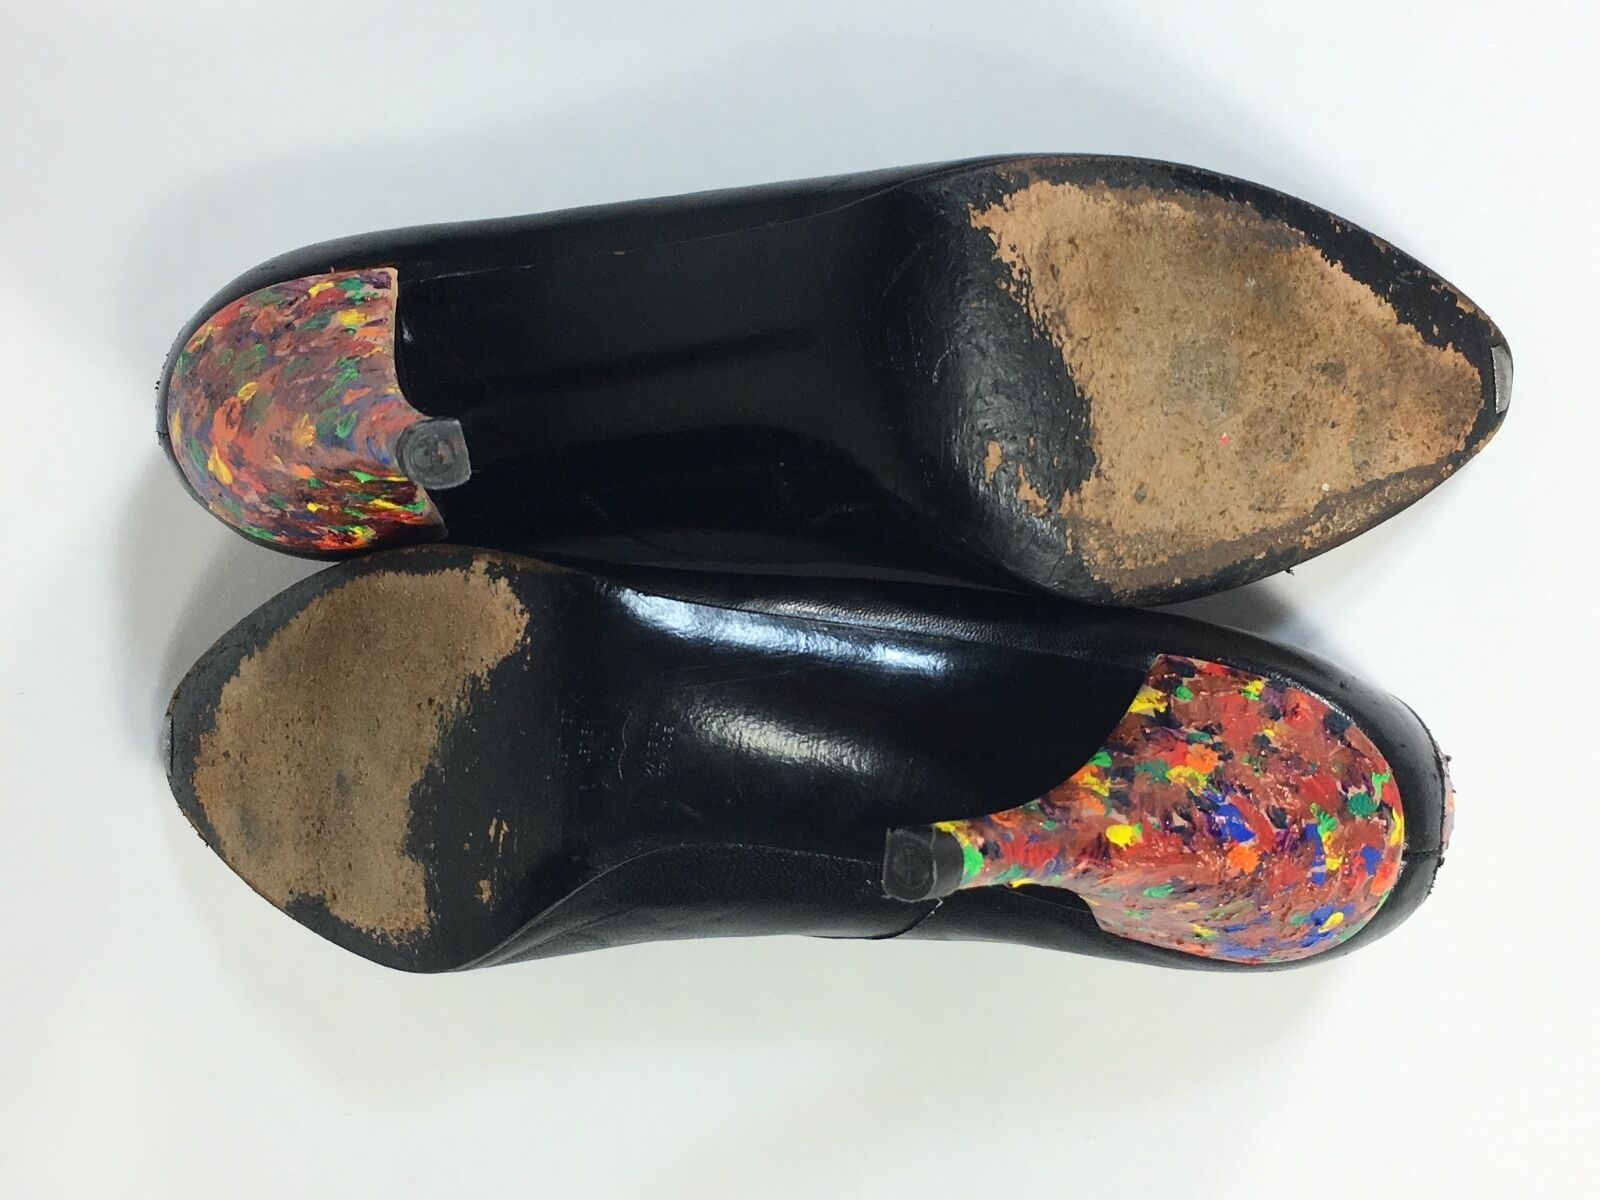 Vintage 607ms Chales Jourdan Jourdan Jourdan Cuero Negro Zapatillas con   Ooak Paleta de Pintura 5e653a